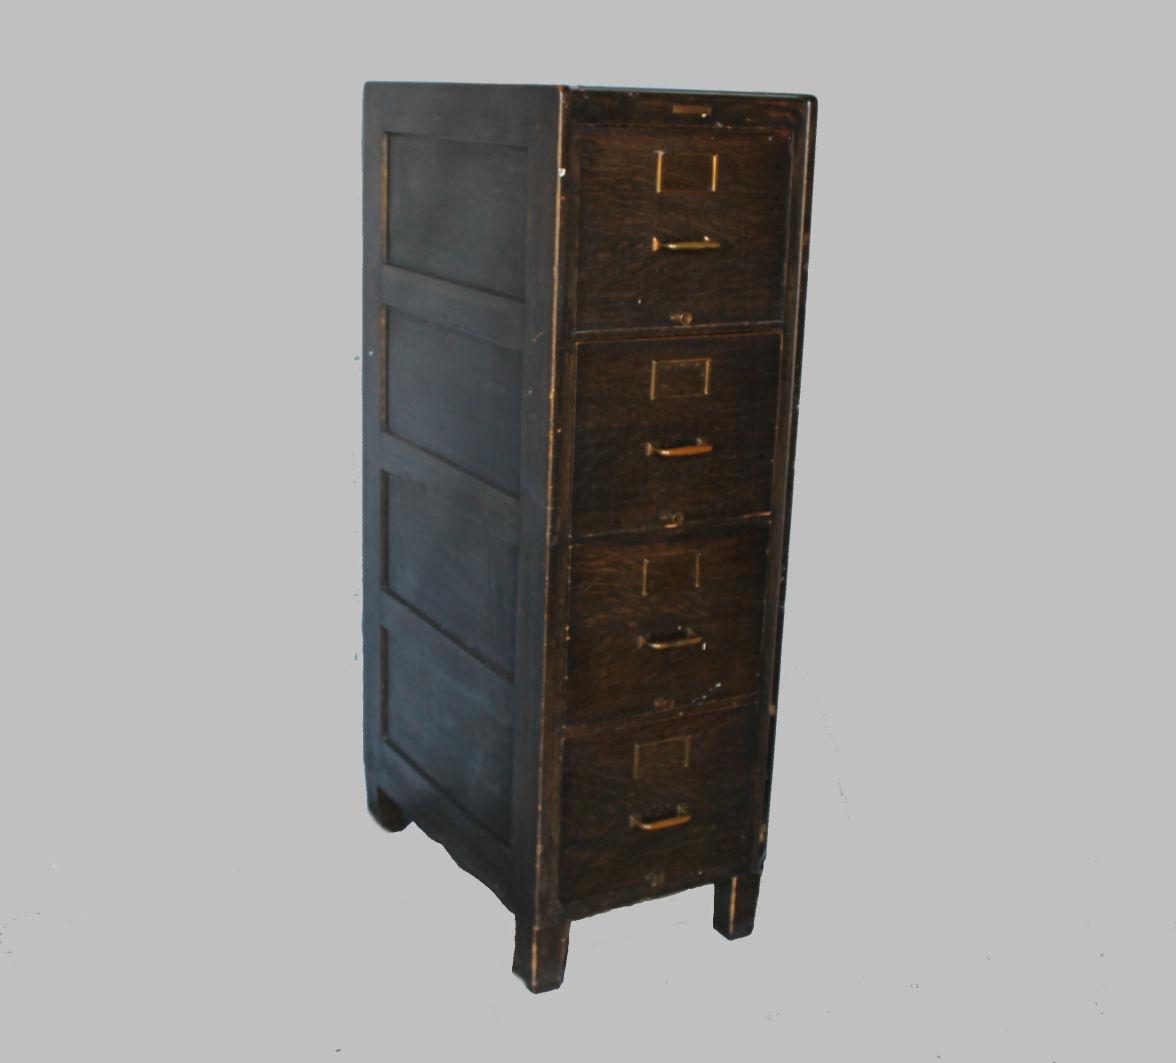 ... Oak Four Drawer File Cabinet U2013 Yawman And Erbe Mfg Co. Sold